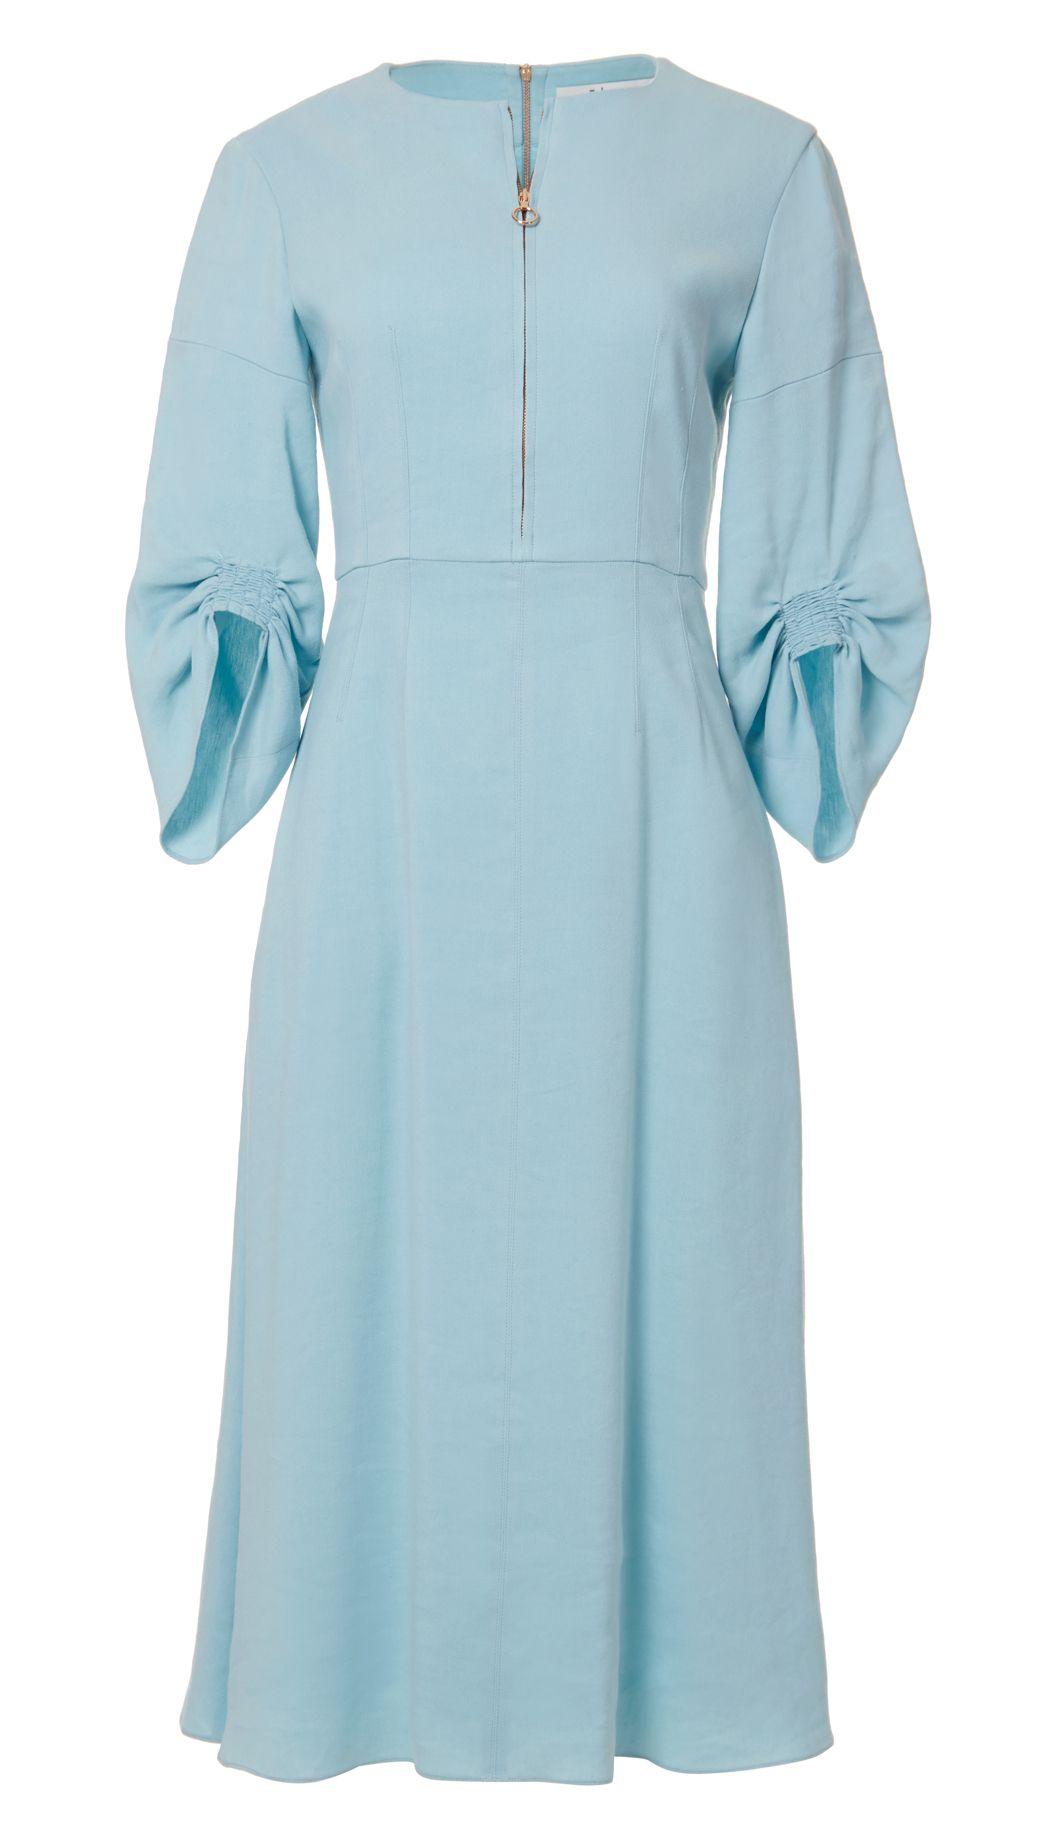 2d10927fdf TIBI S MARTA LINEN DRESS